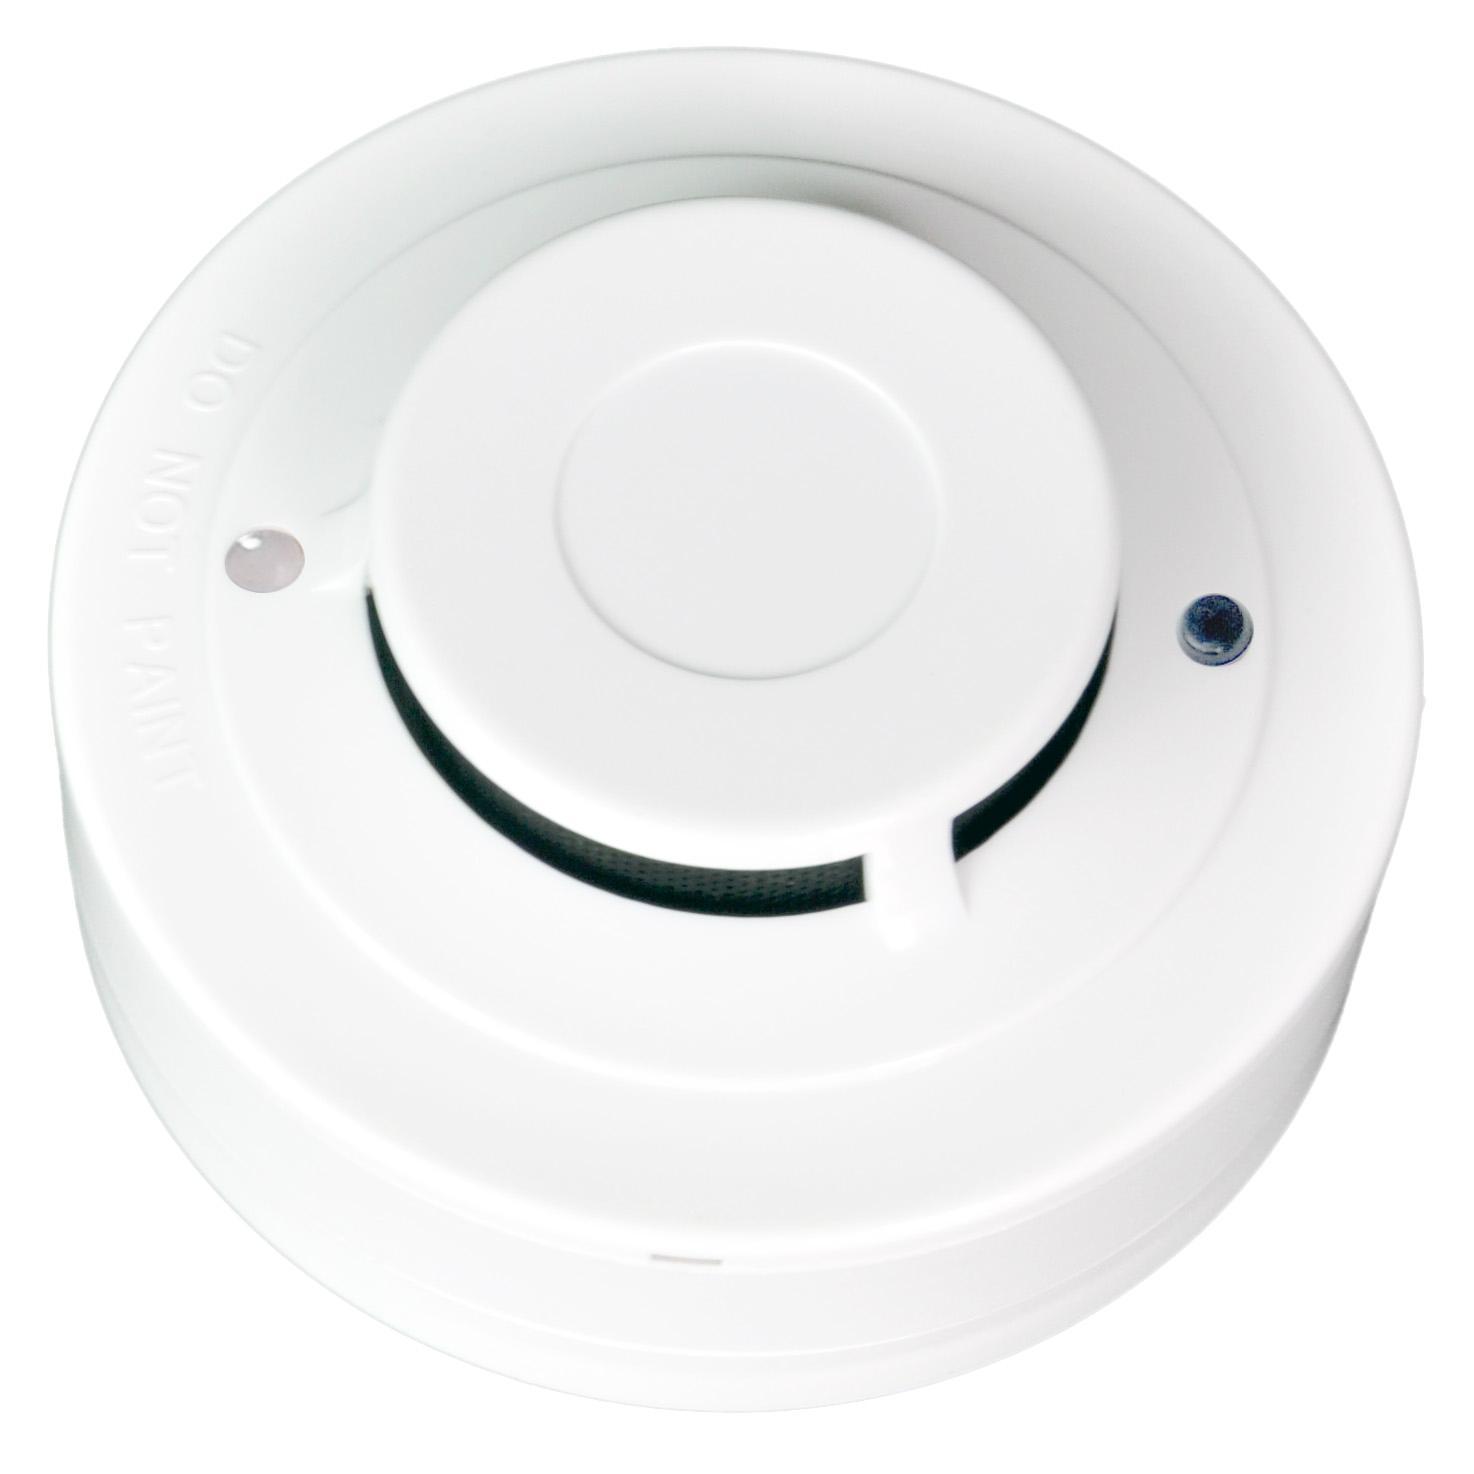 4Zones Conventional Fire Alarm Control Panel 2